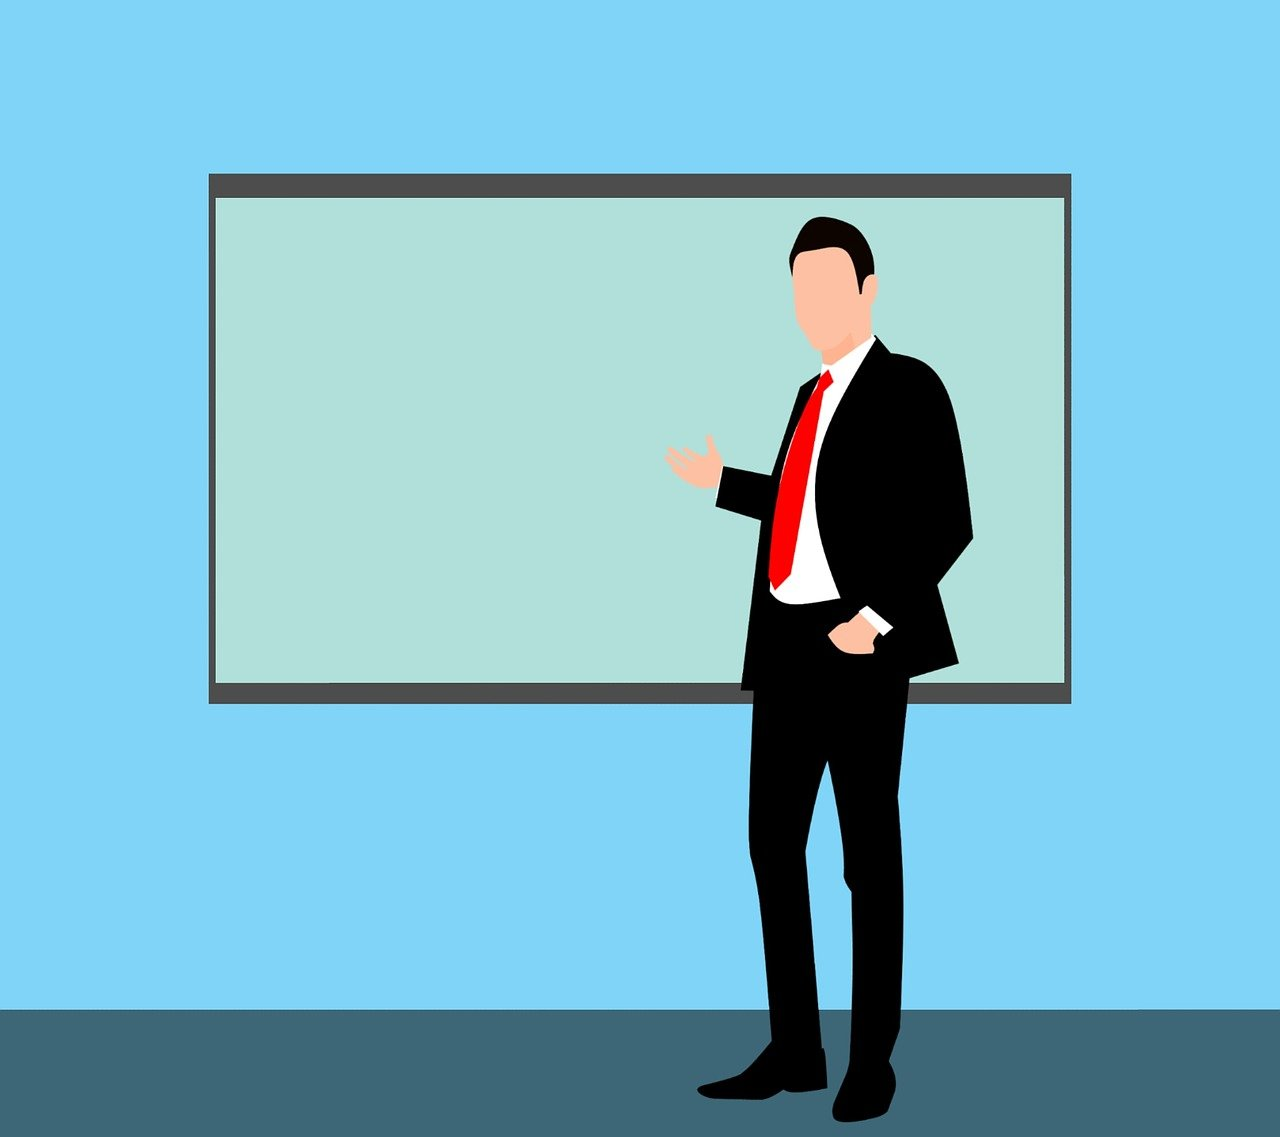 Vyondを学べるおすすめUdemy講座をご紹介【アニメーションを活用しよう】